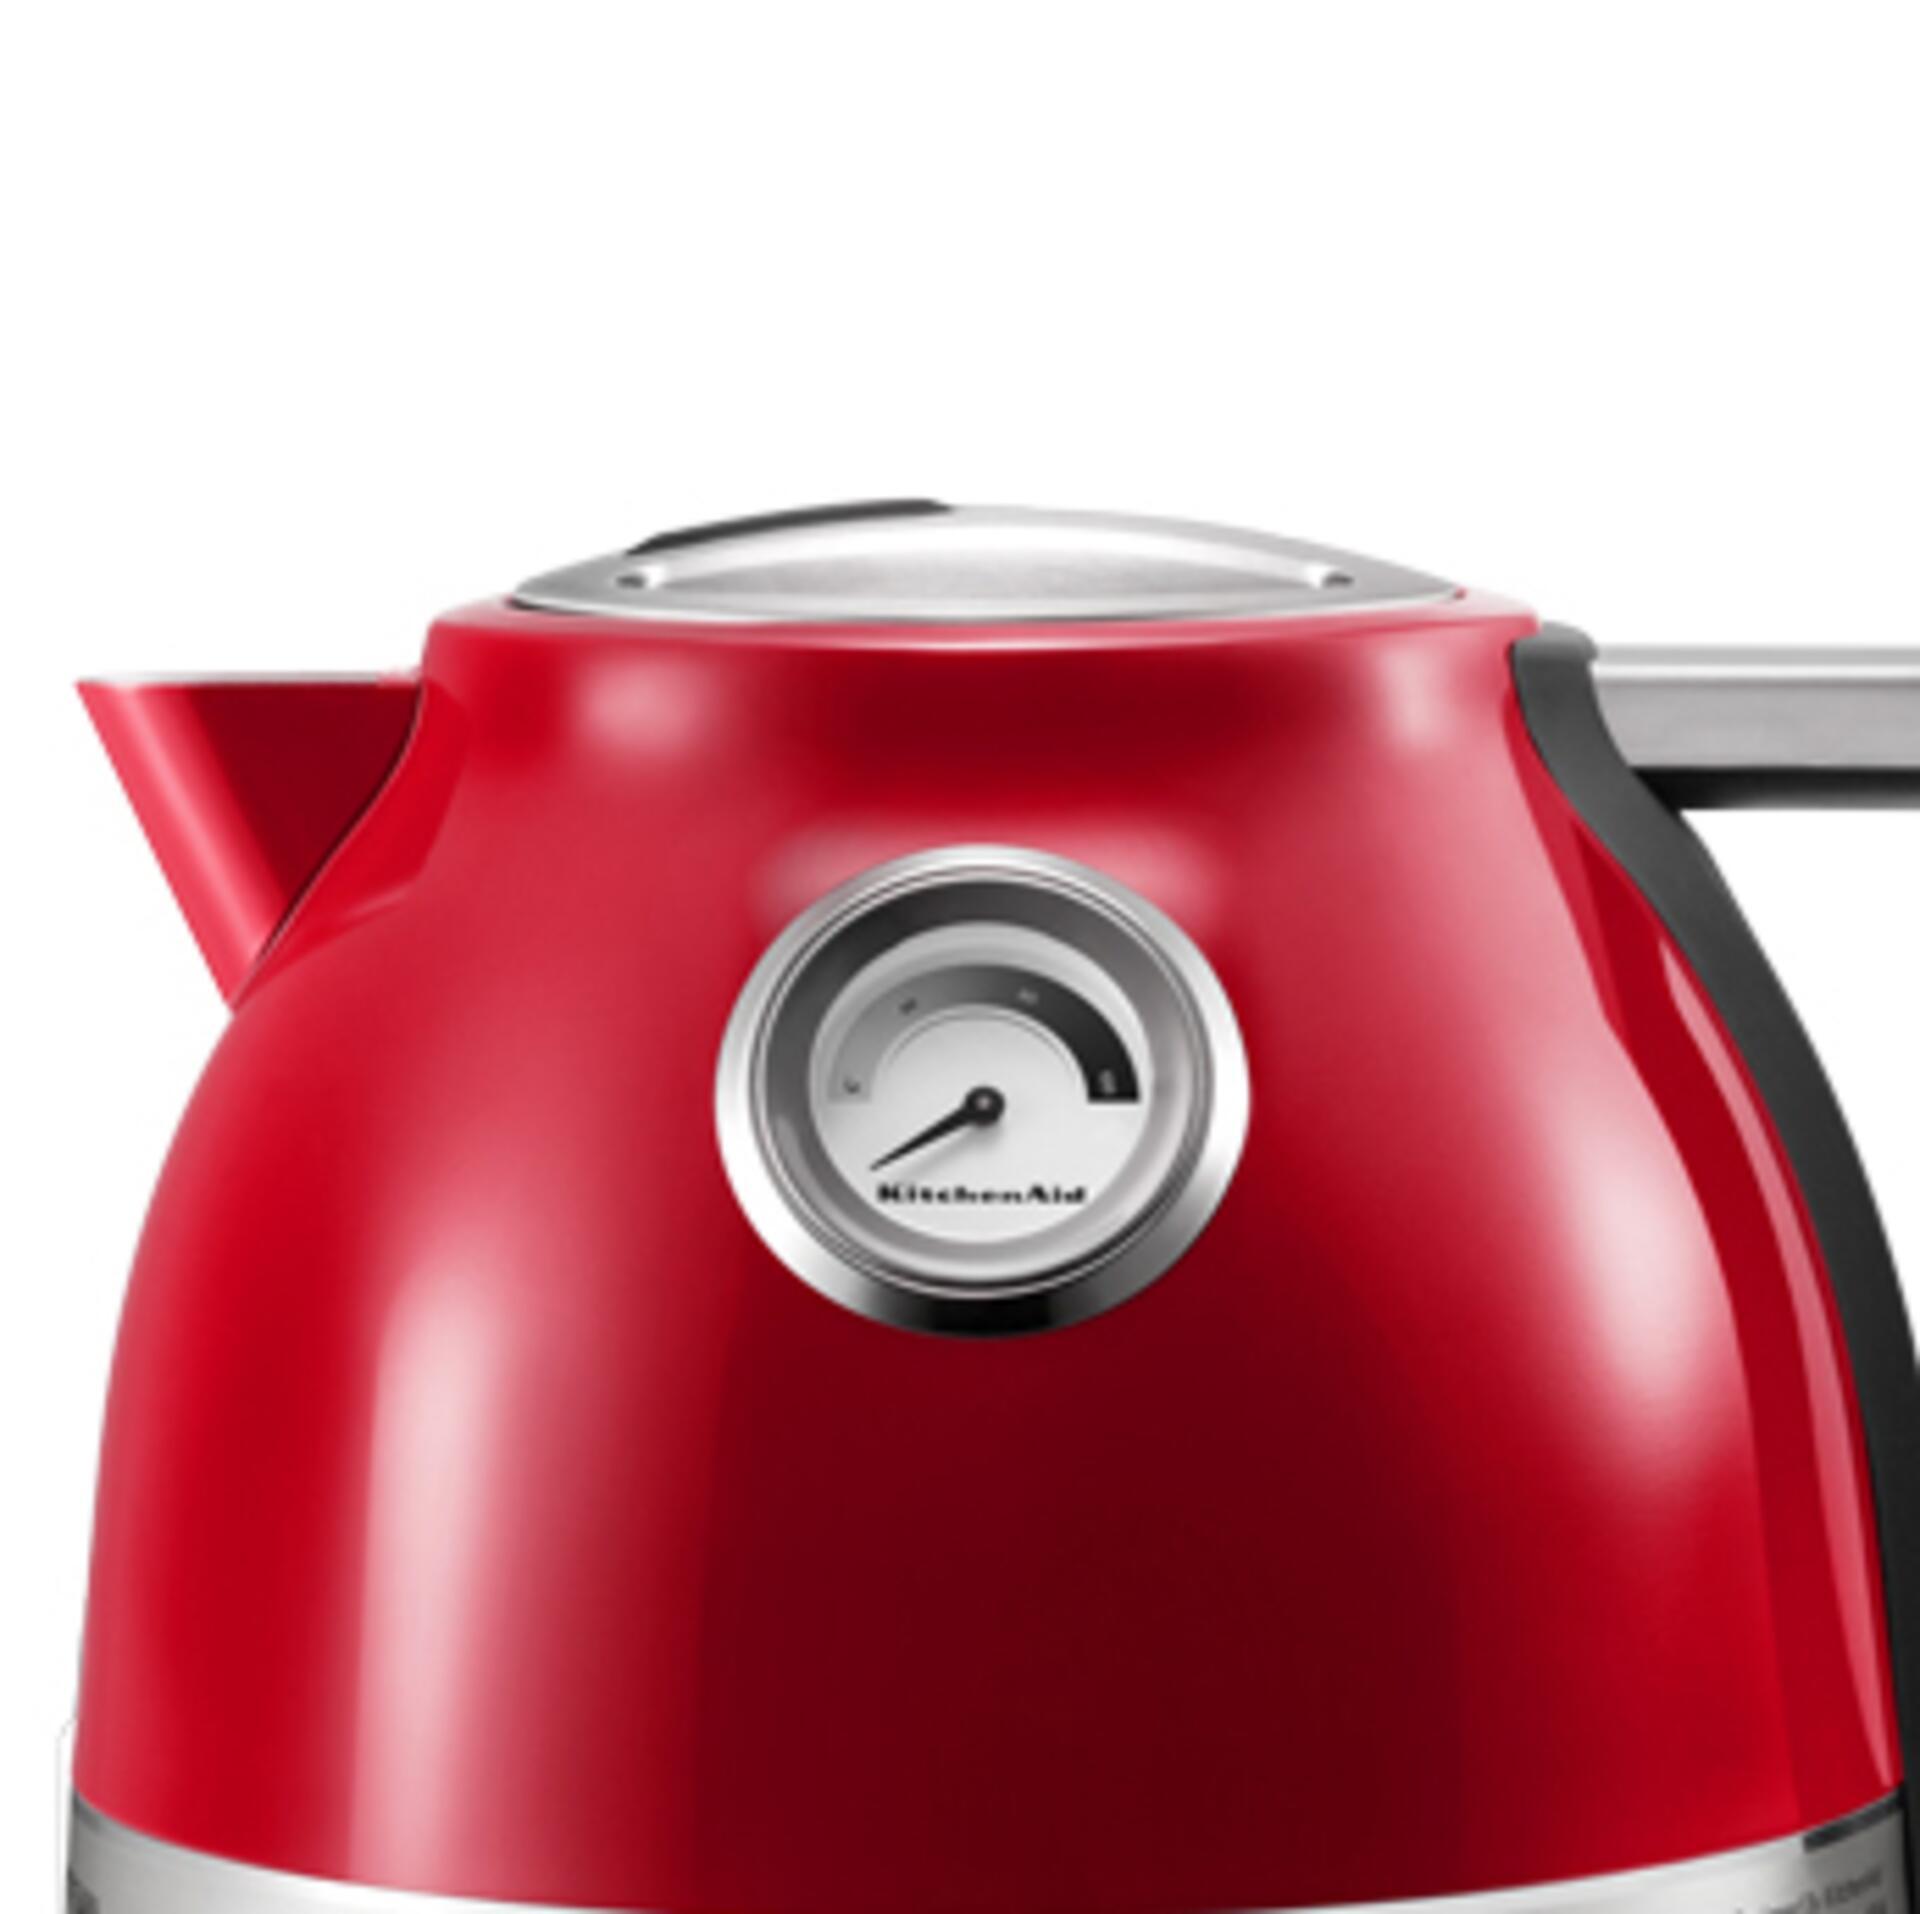 Kitchenaid Artisan Wasserkocher Schwarz 5KEK1522EOB